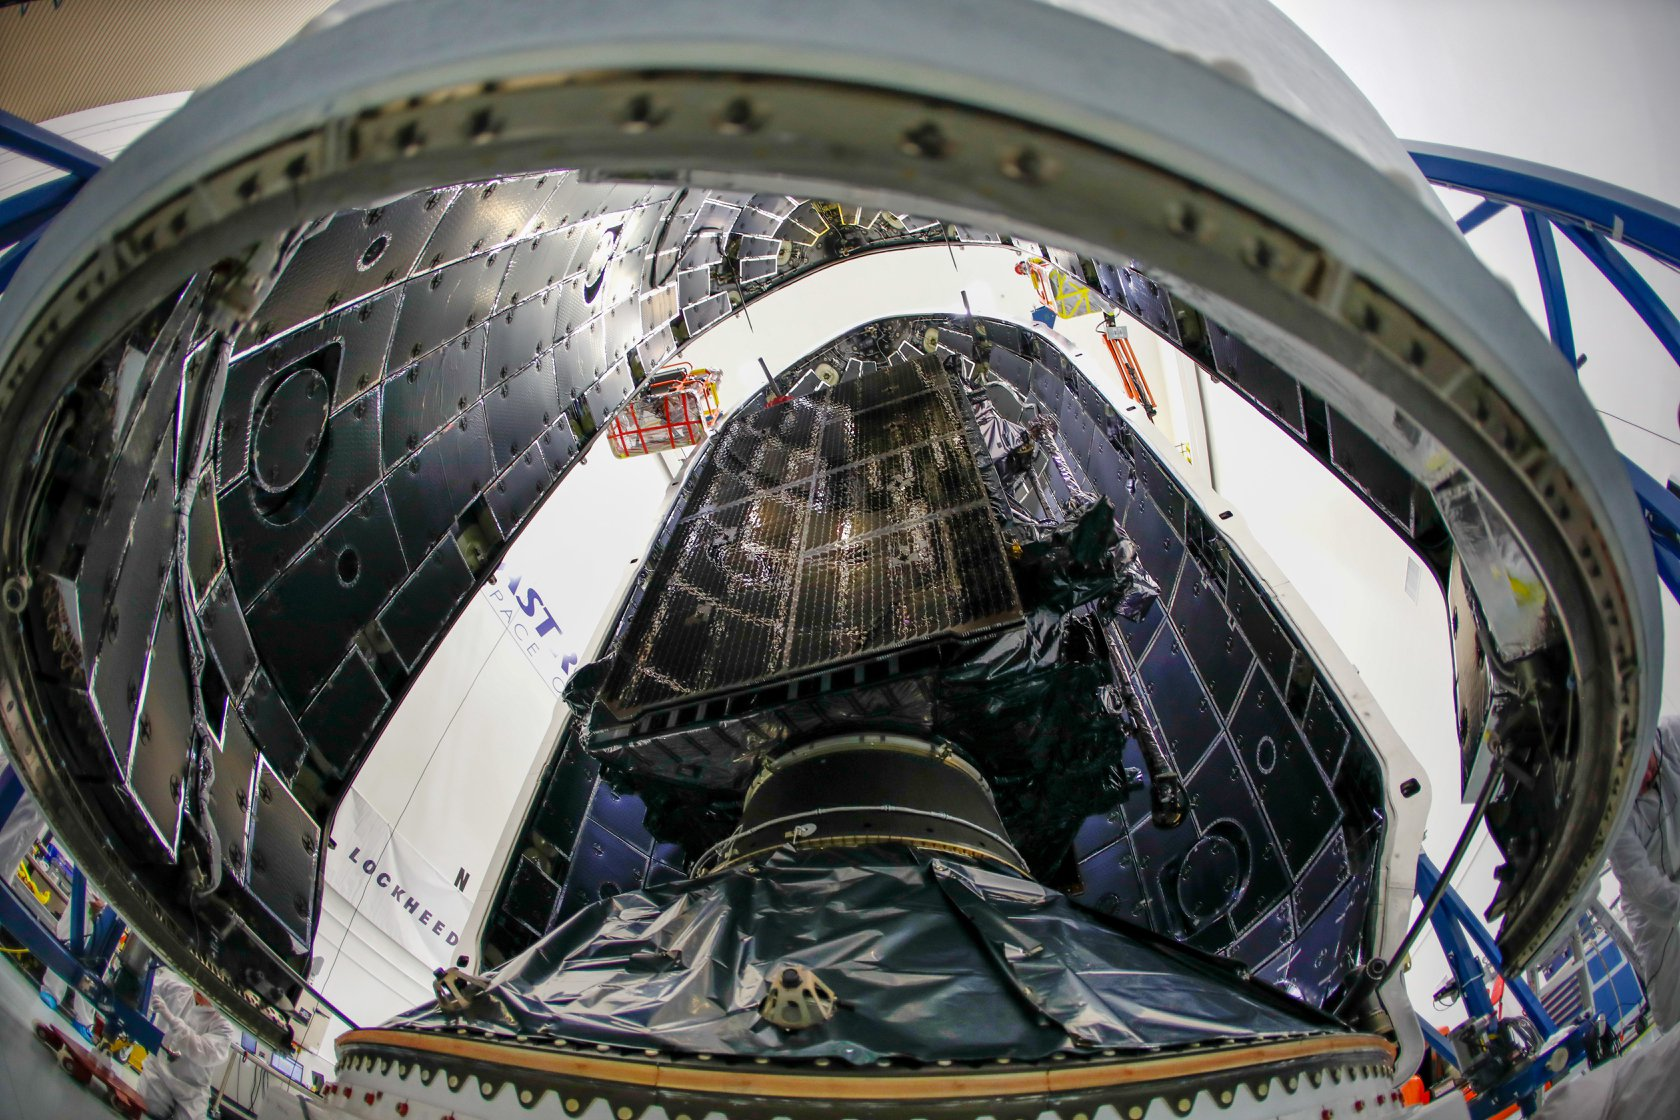 GPS III SV01 Falcon 9 encapsulation 120718 (Lockheed Martin) 4